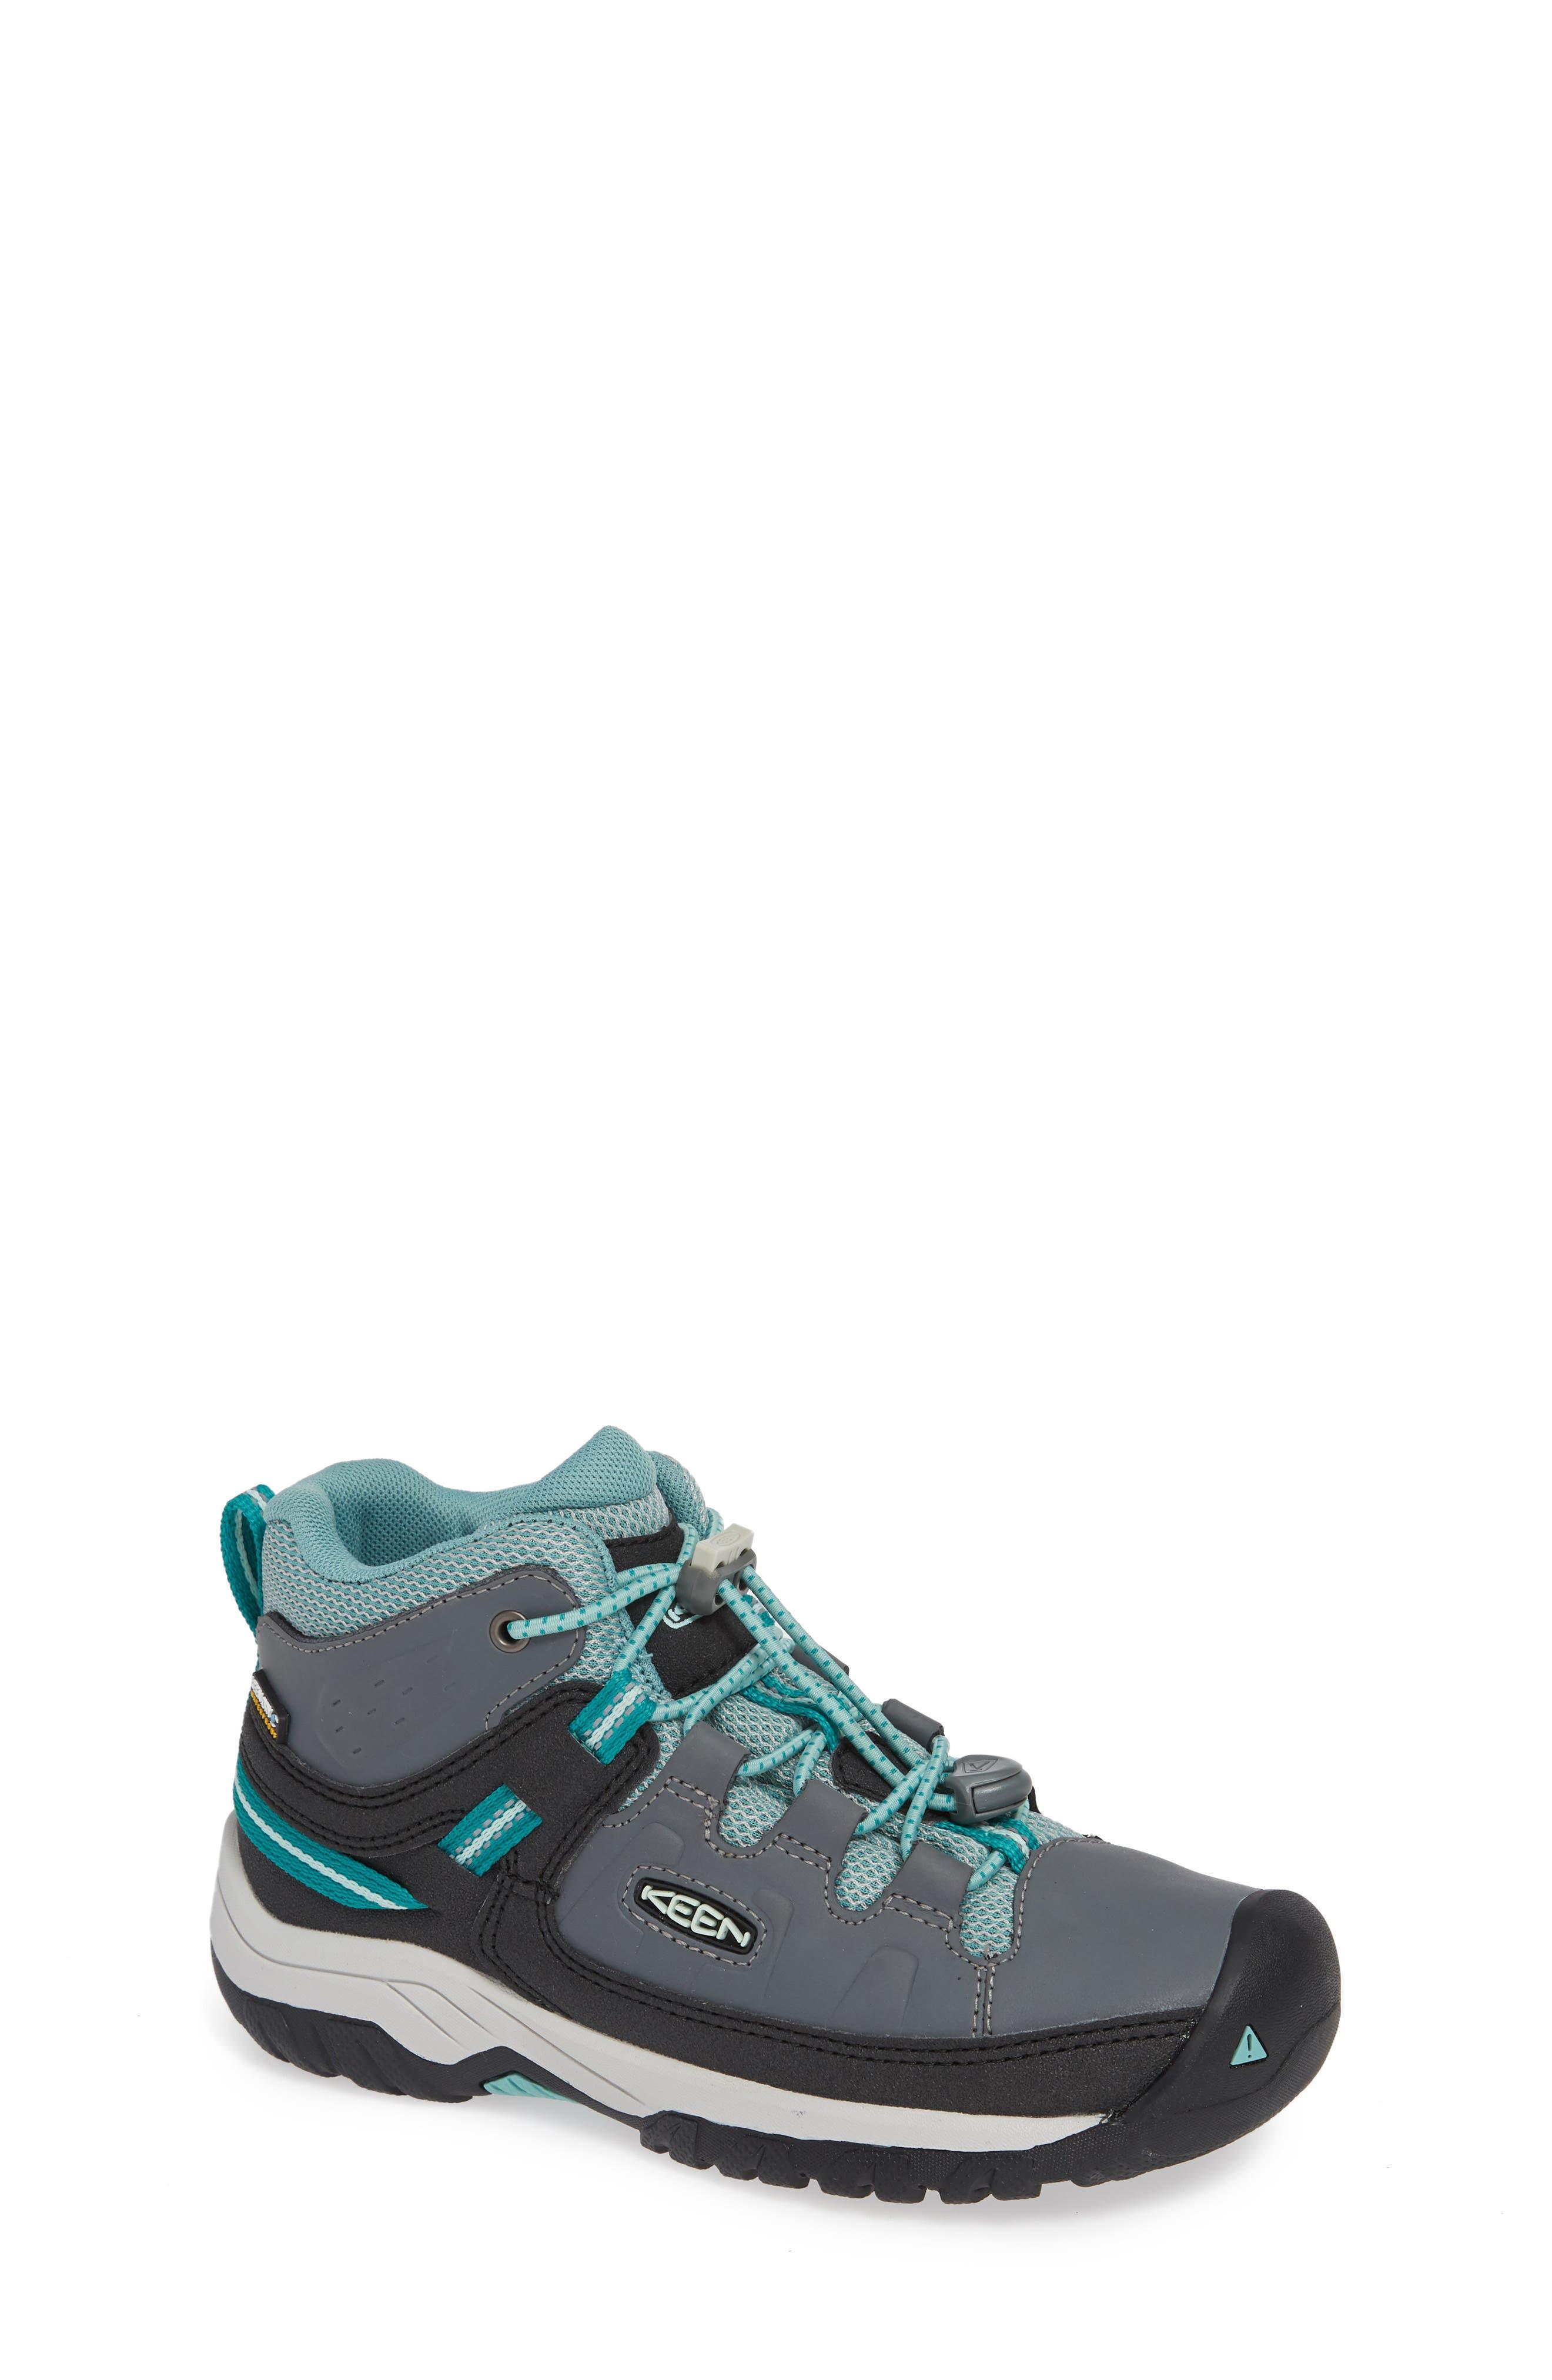 KEEN, Targhee Mid Waterproof Hiking Boot, Main thumbnail 1, color, GREY/ WASABI